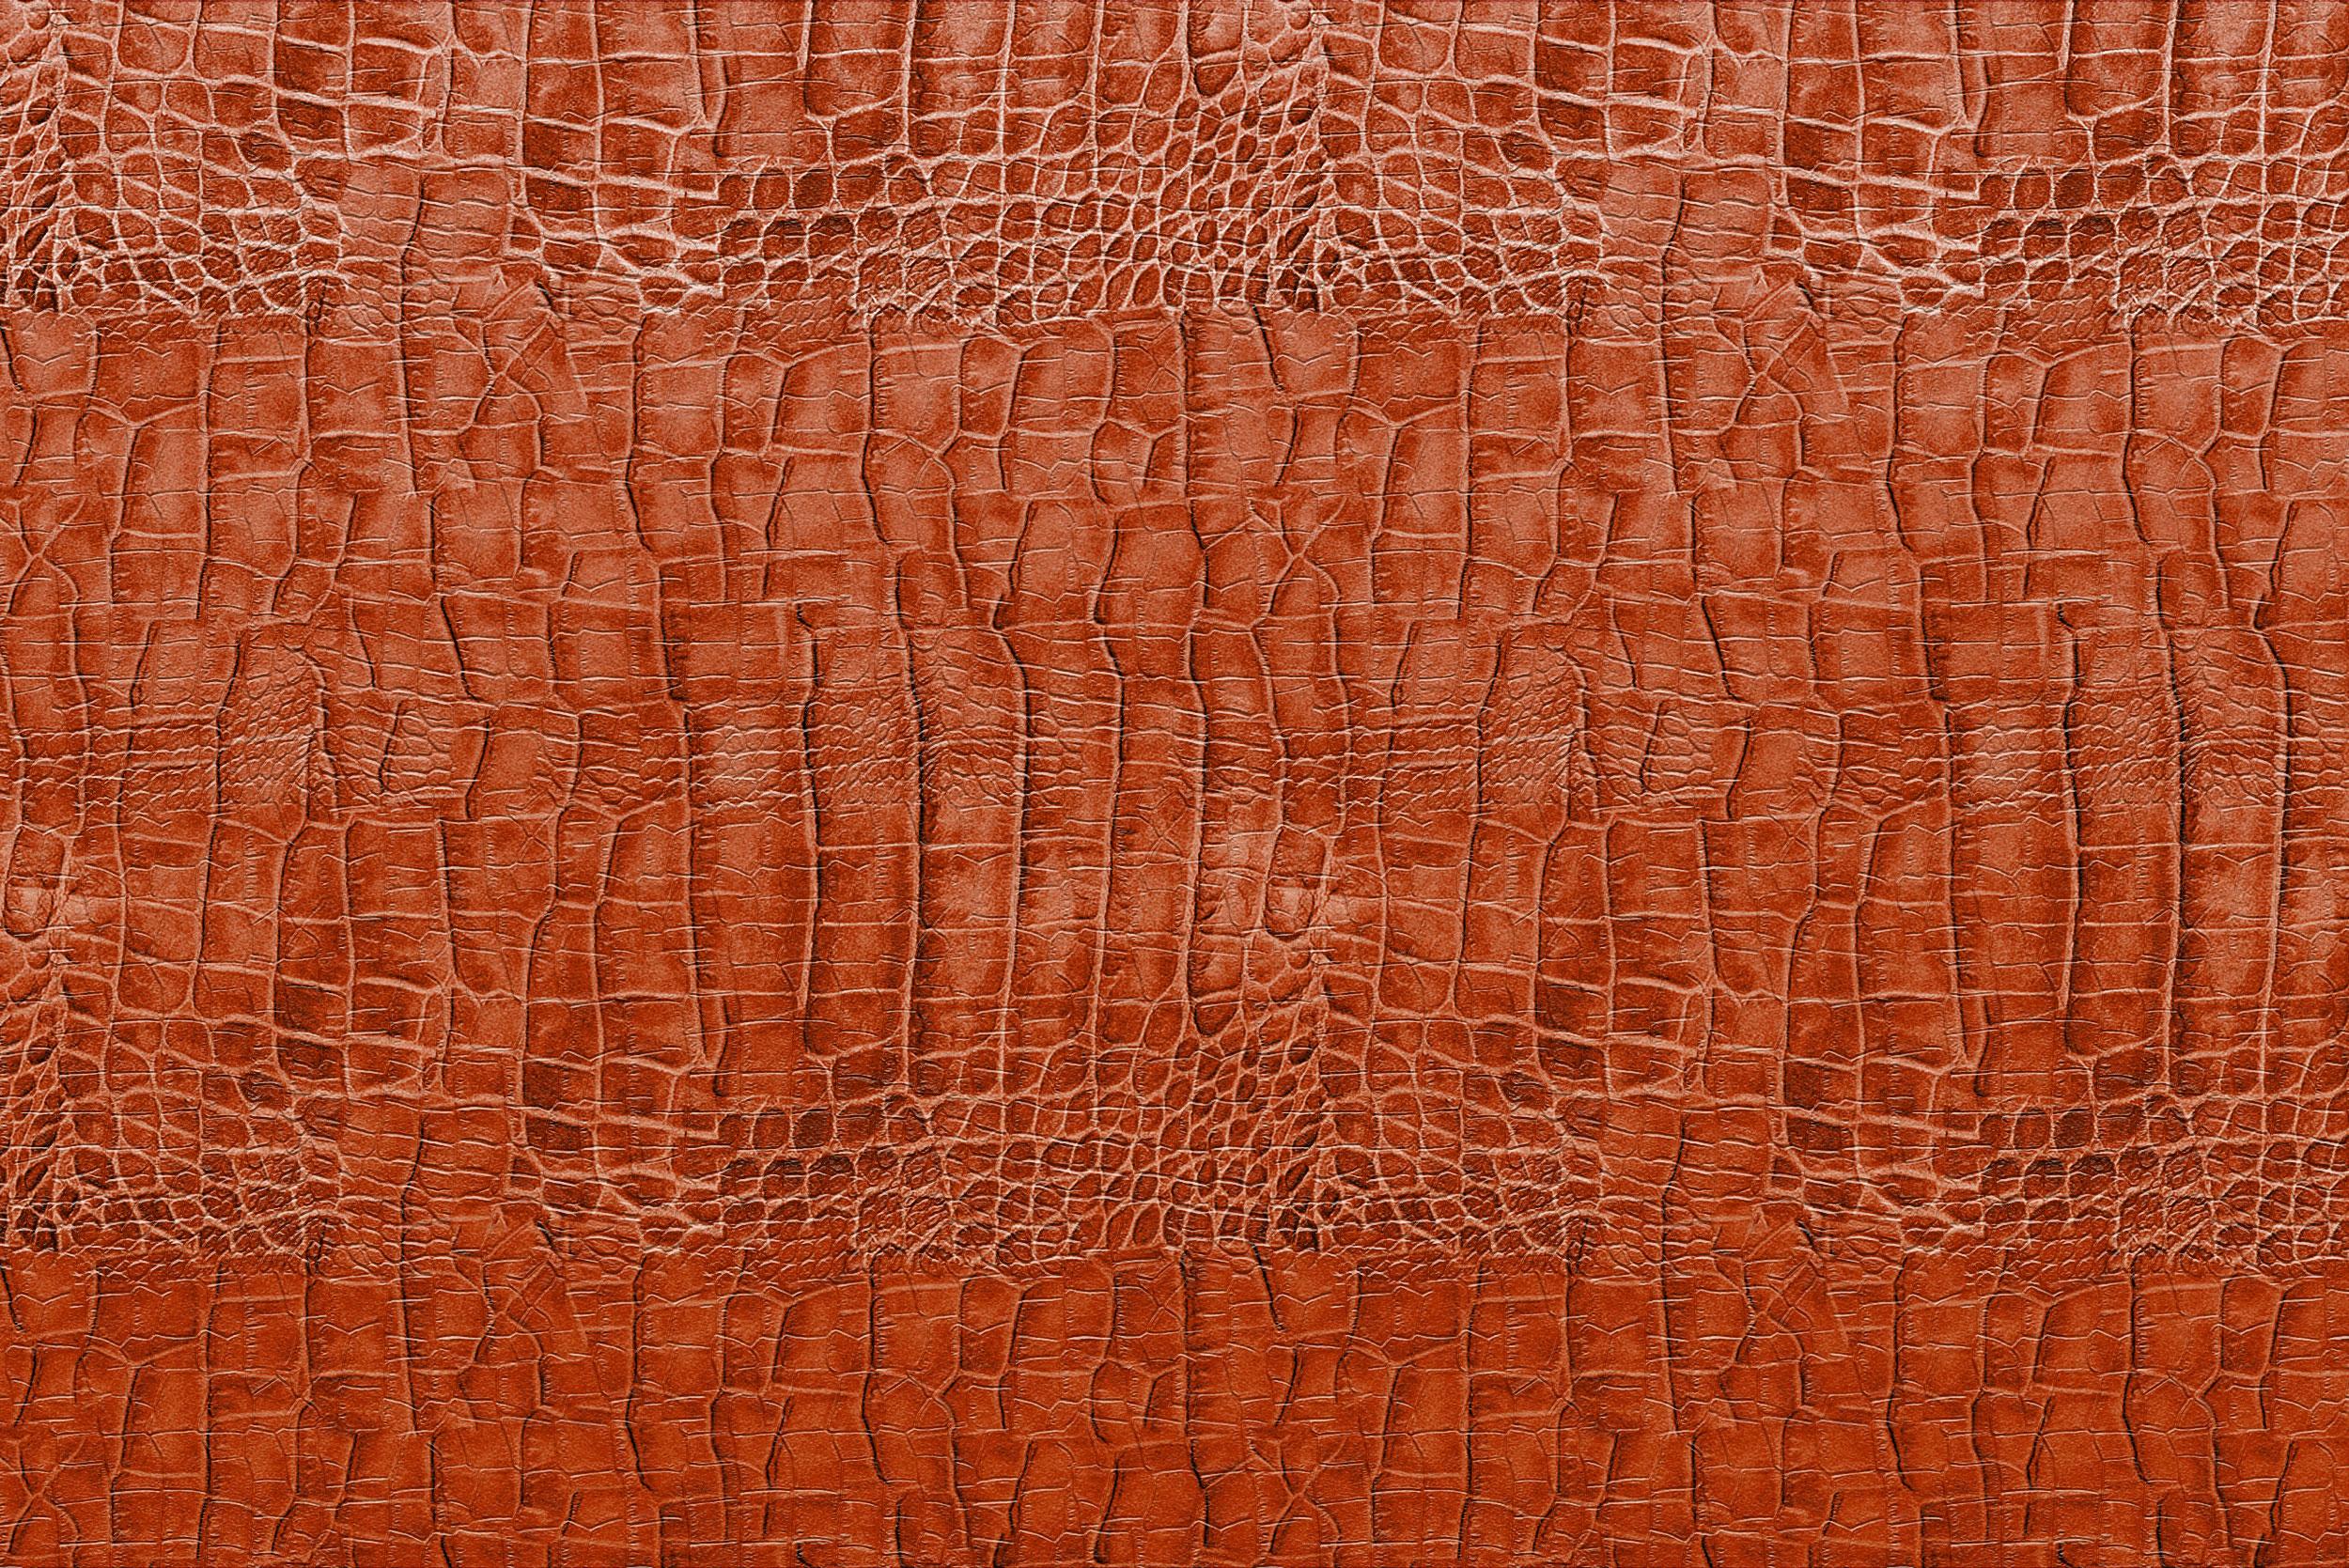 Картинка оранжево коричневая текстура кожи крокодила